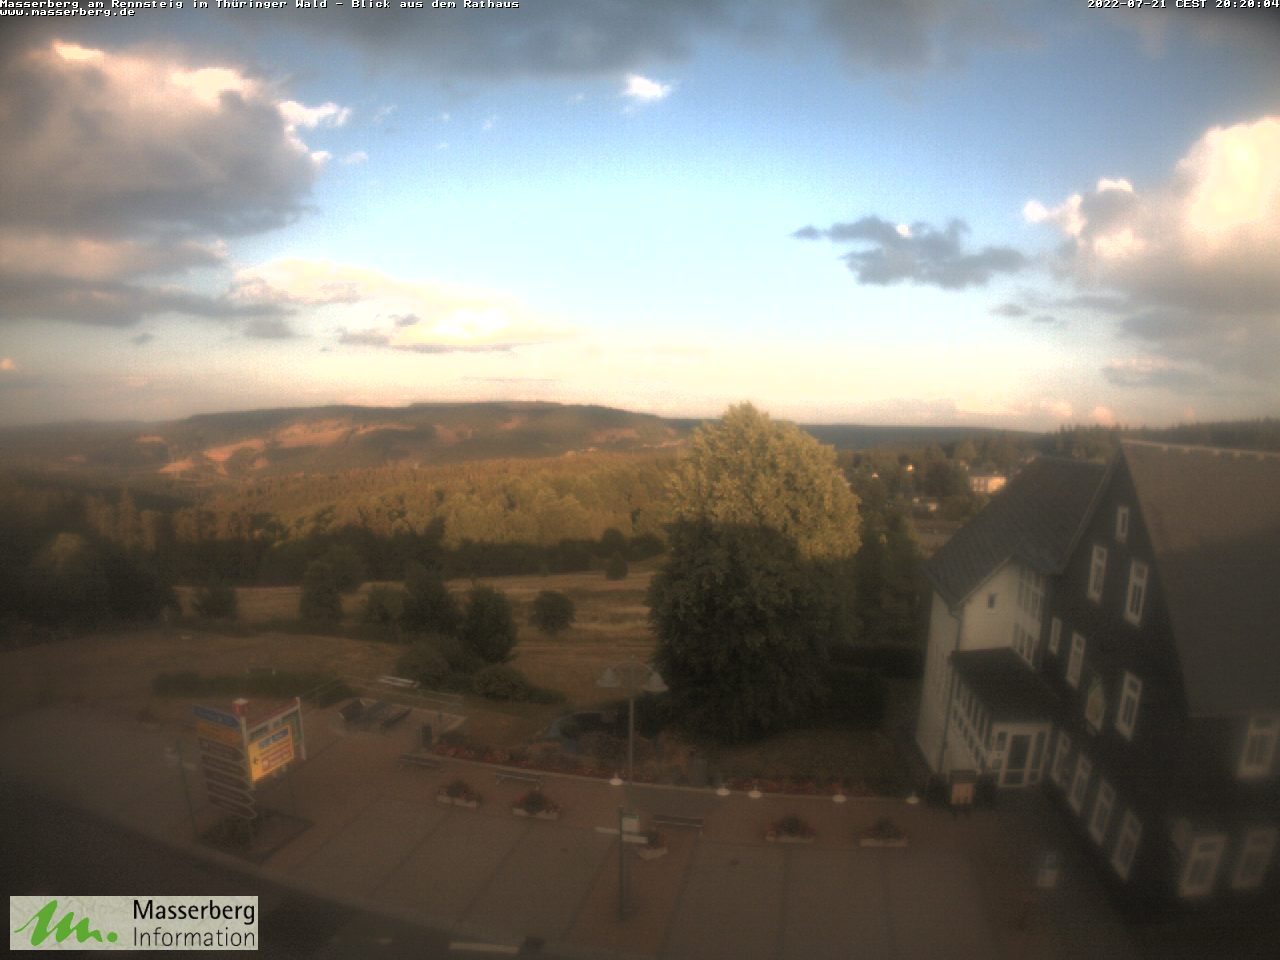 Webcam im Rathaus Masserberg